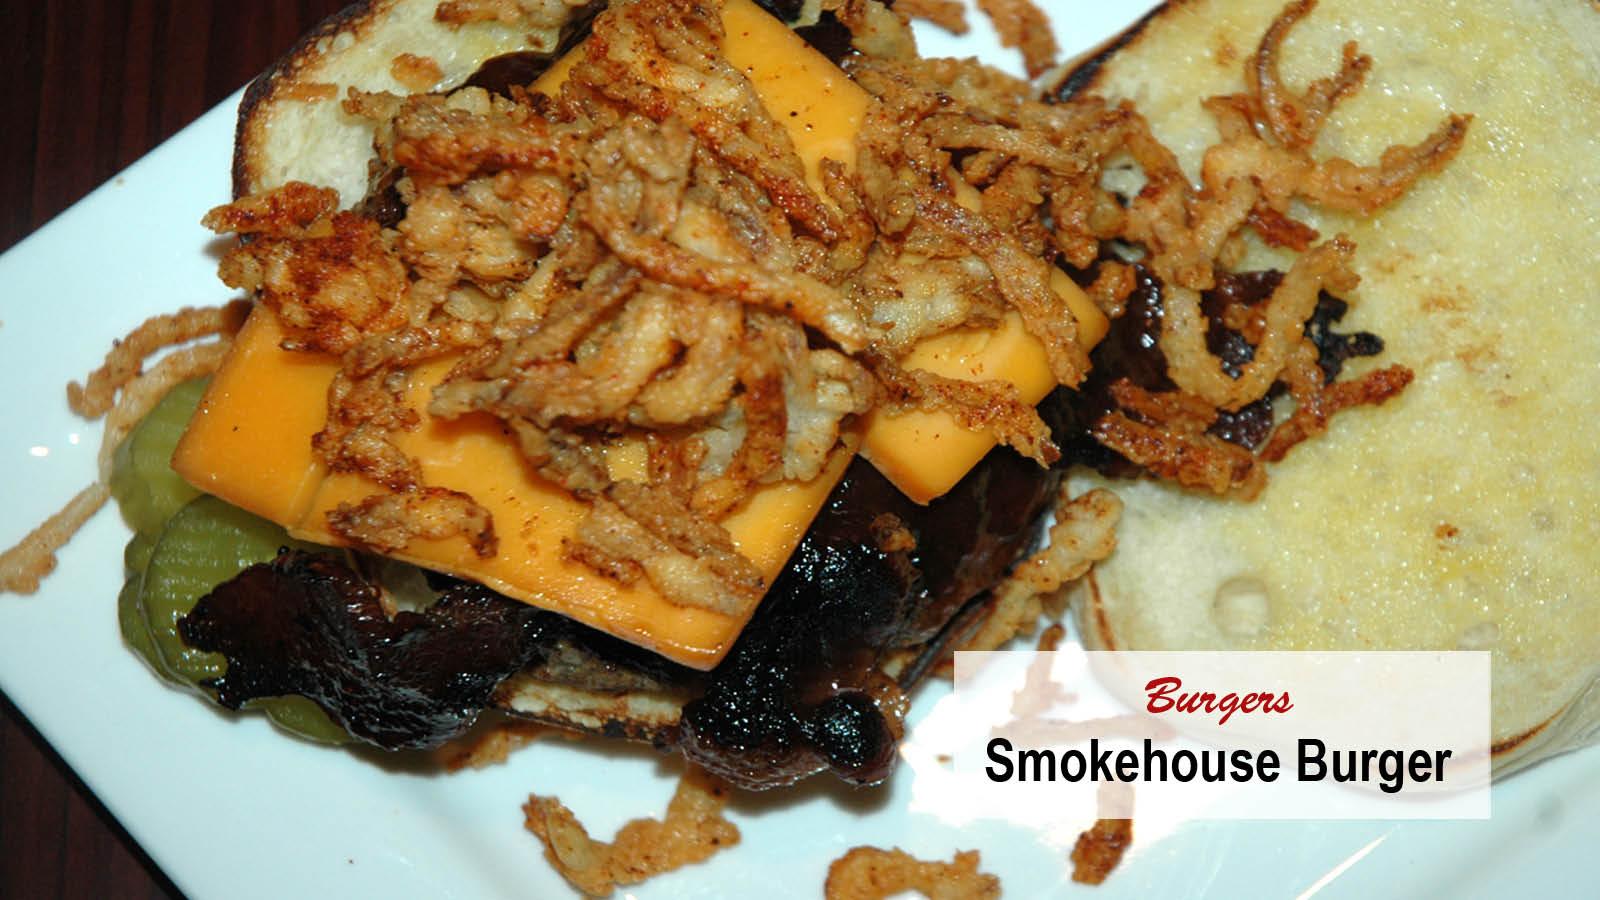 DuBois smokehouse burger - smokin' good